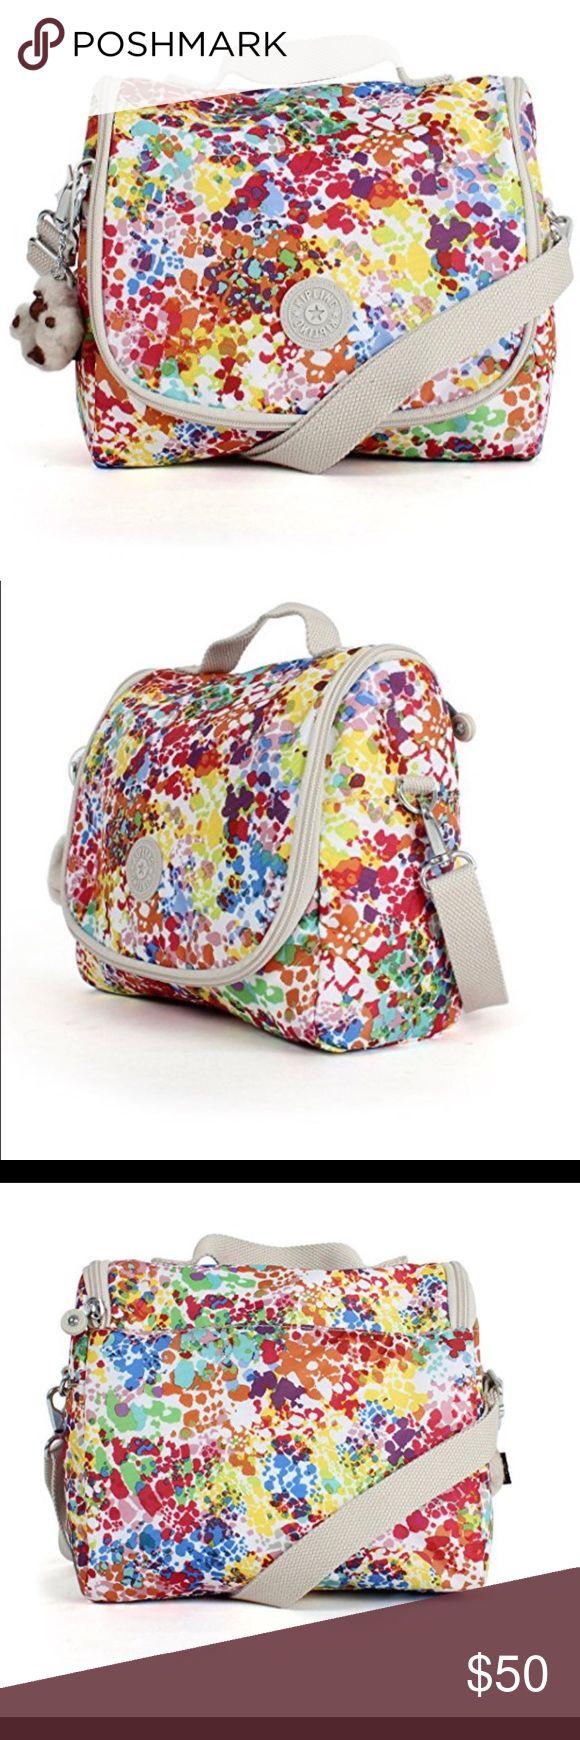 Kipling lunch bag Cross body lunch bag. New in bag. Never used. Kipling Bags Crossbody Bags